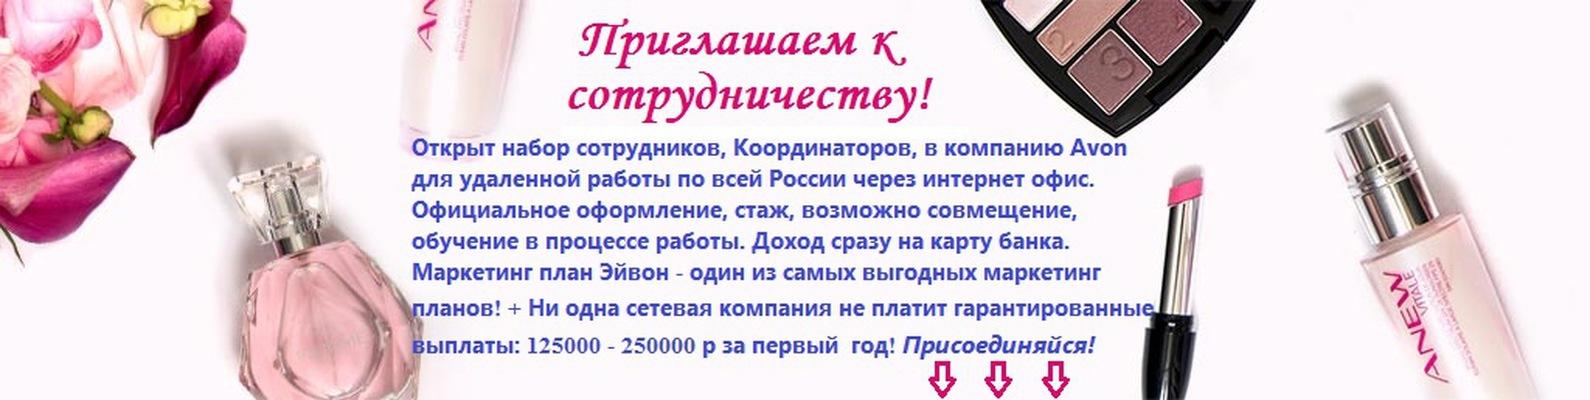 Найти пред авон купить набор косметики для макияжа в беларуси